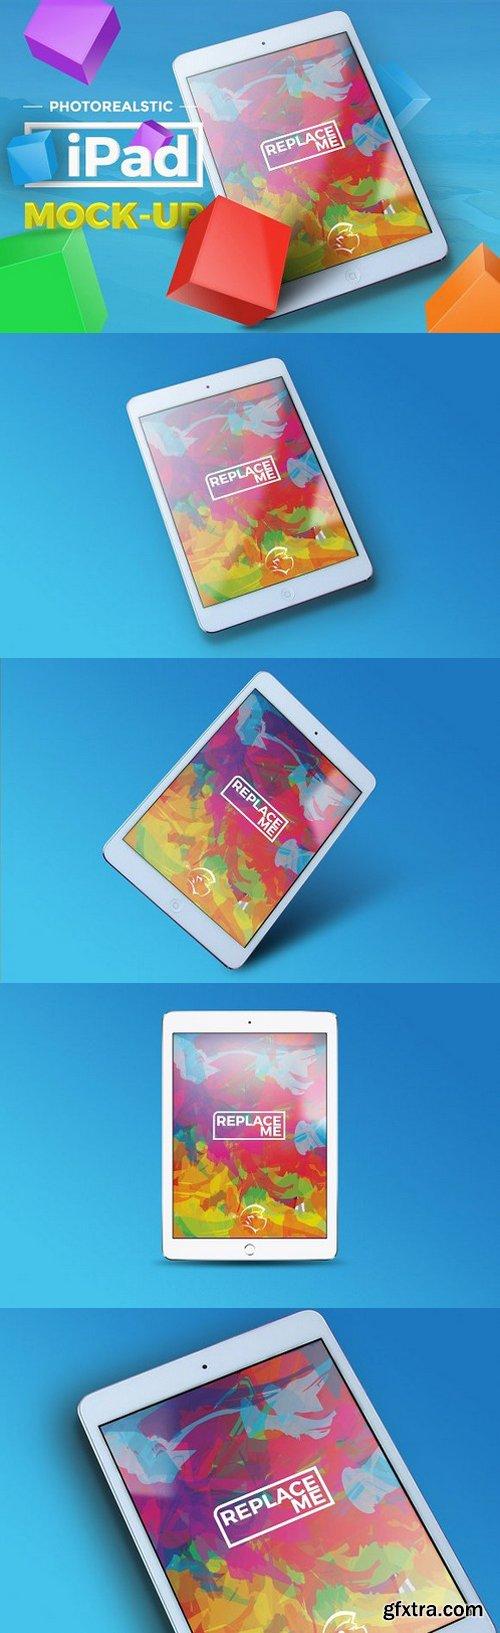 CM - 4 Photorealistic iPad Mock-up 1080984